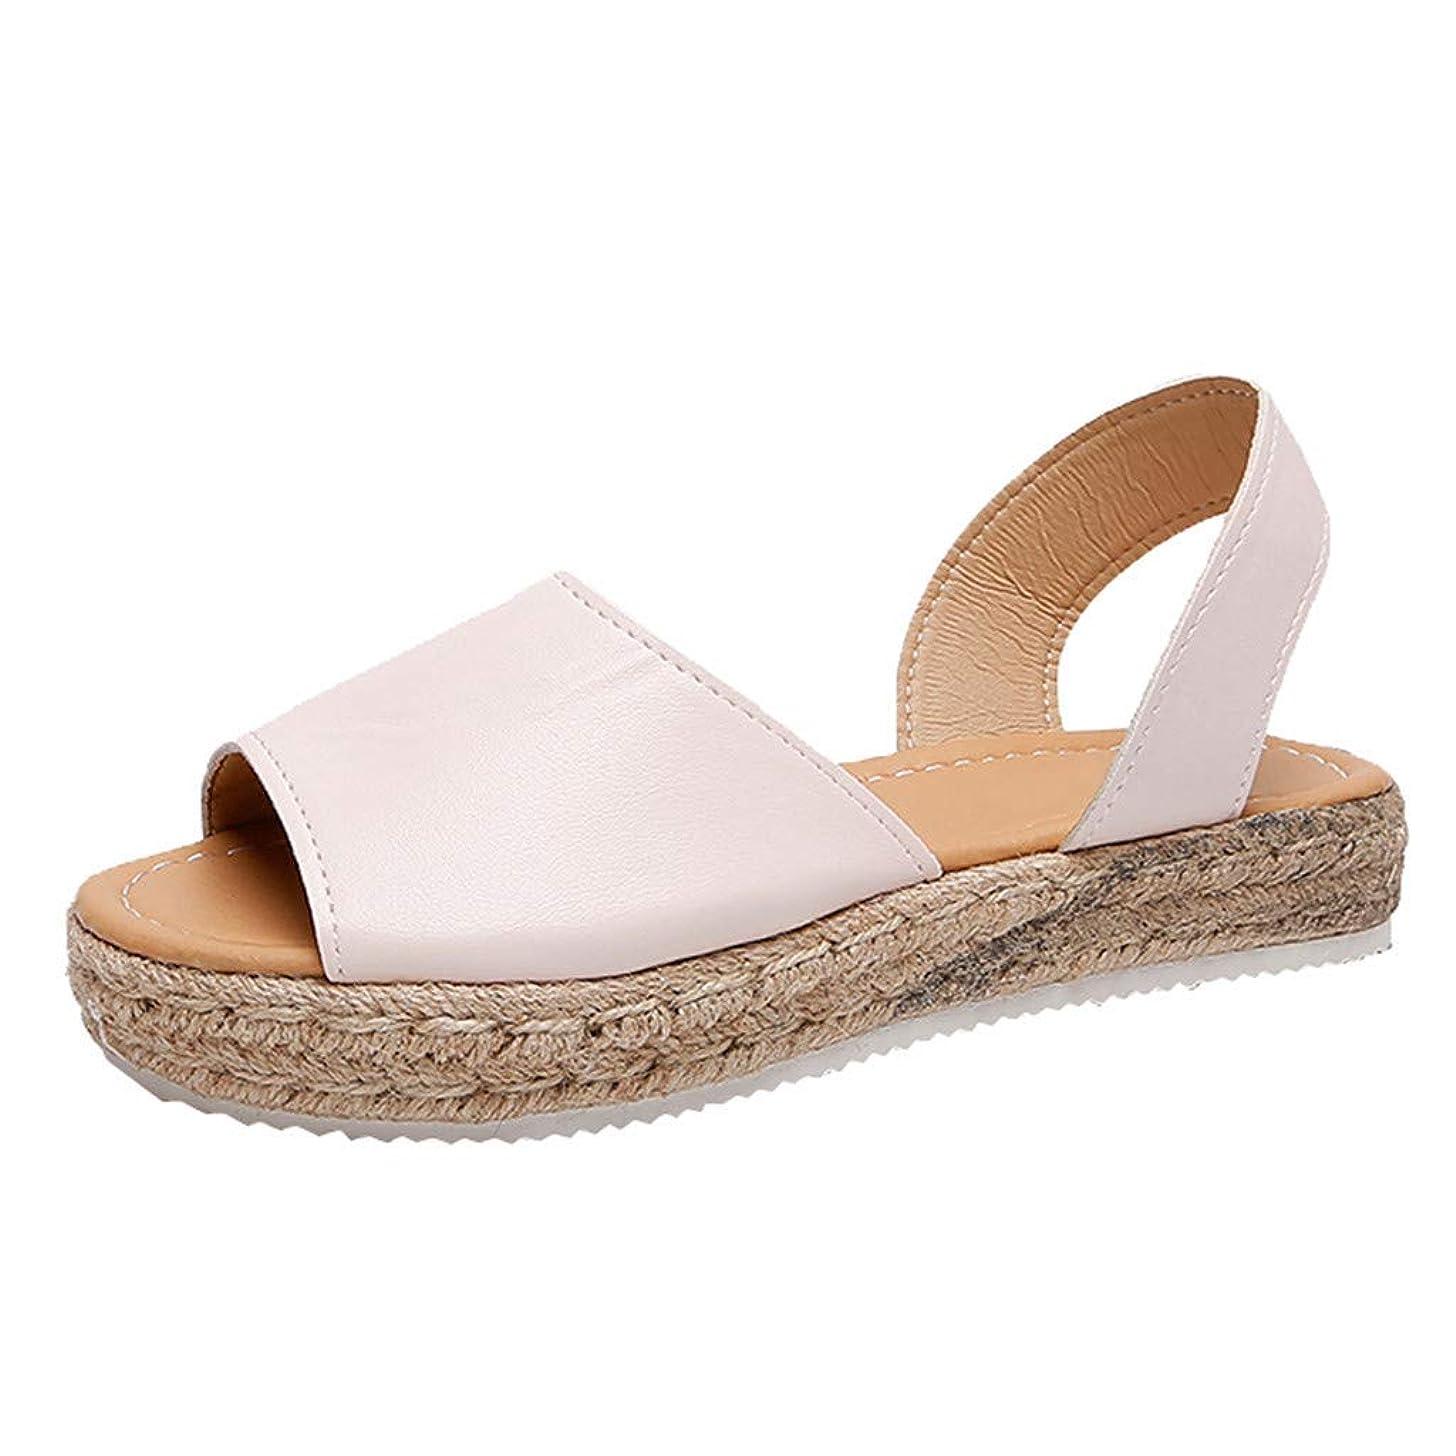 〓COOlCCI〓Women's Casual Ankle Strap Open Toe Sandals Espadrille Platform Wedge Sandals Slingback Wedge Sandals